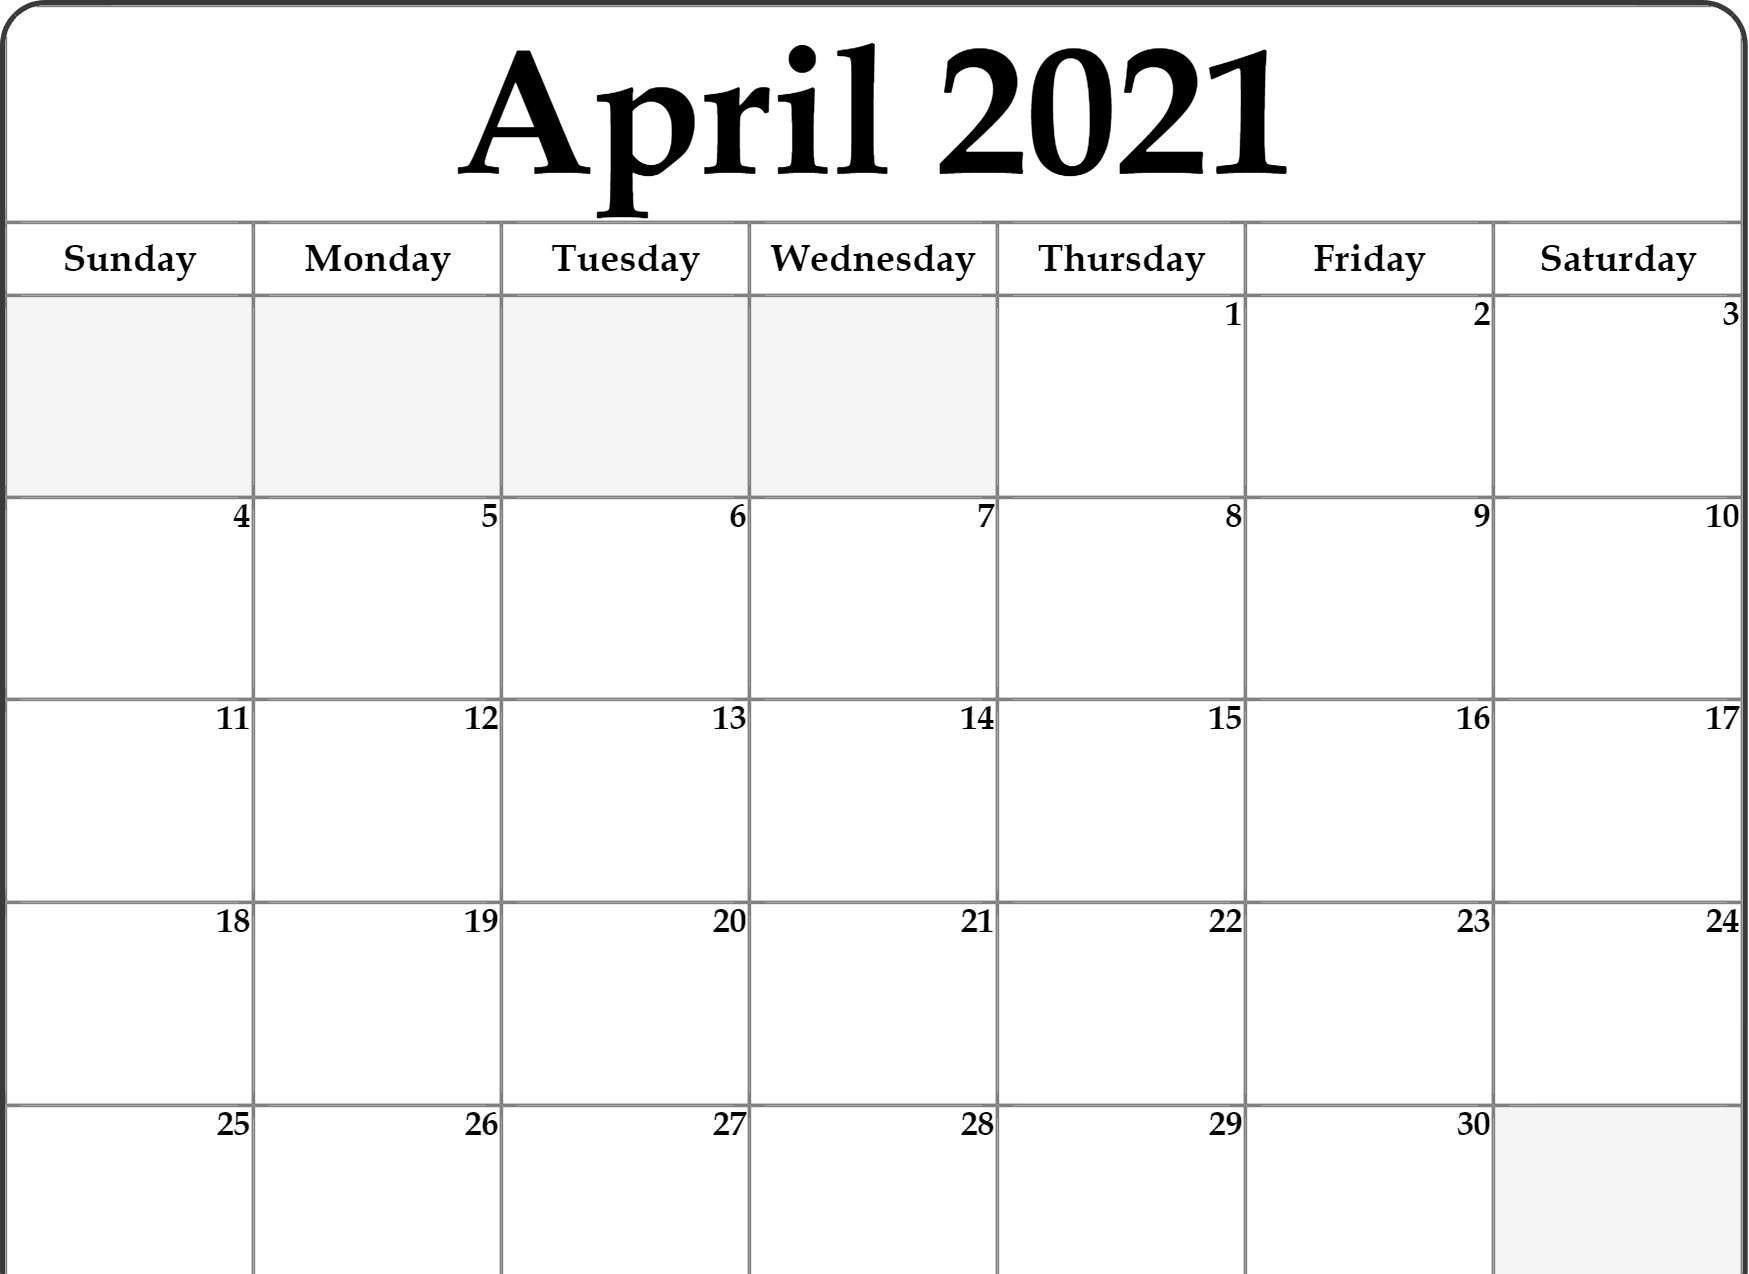 April 2021 Printable Calendar Pdf In 2020 | Calendar Word